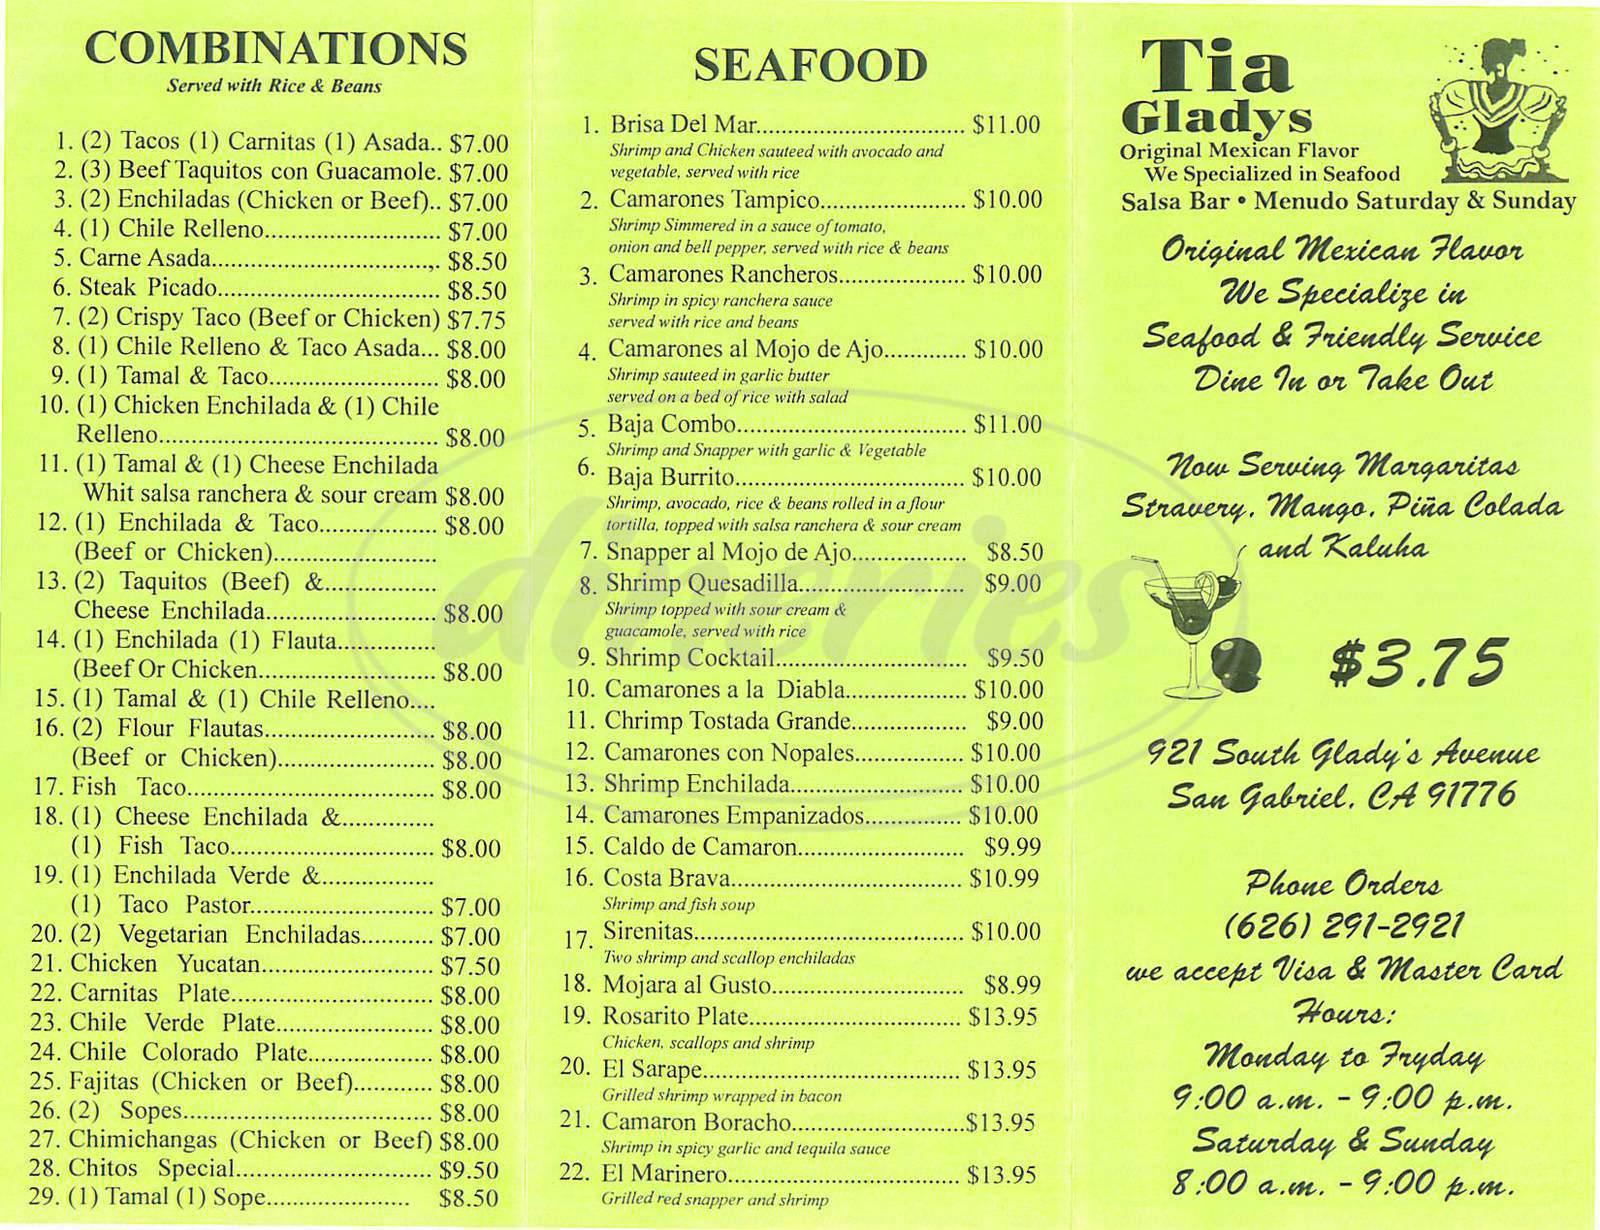 menu for Tia Gladys